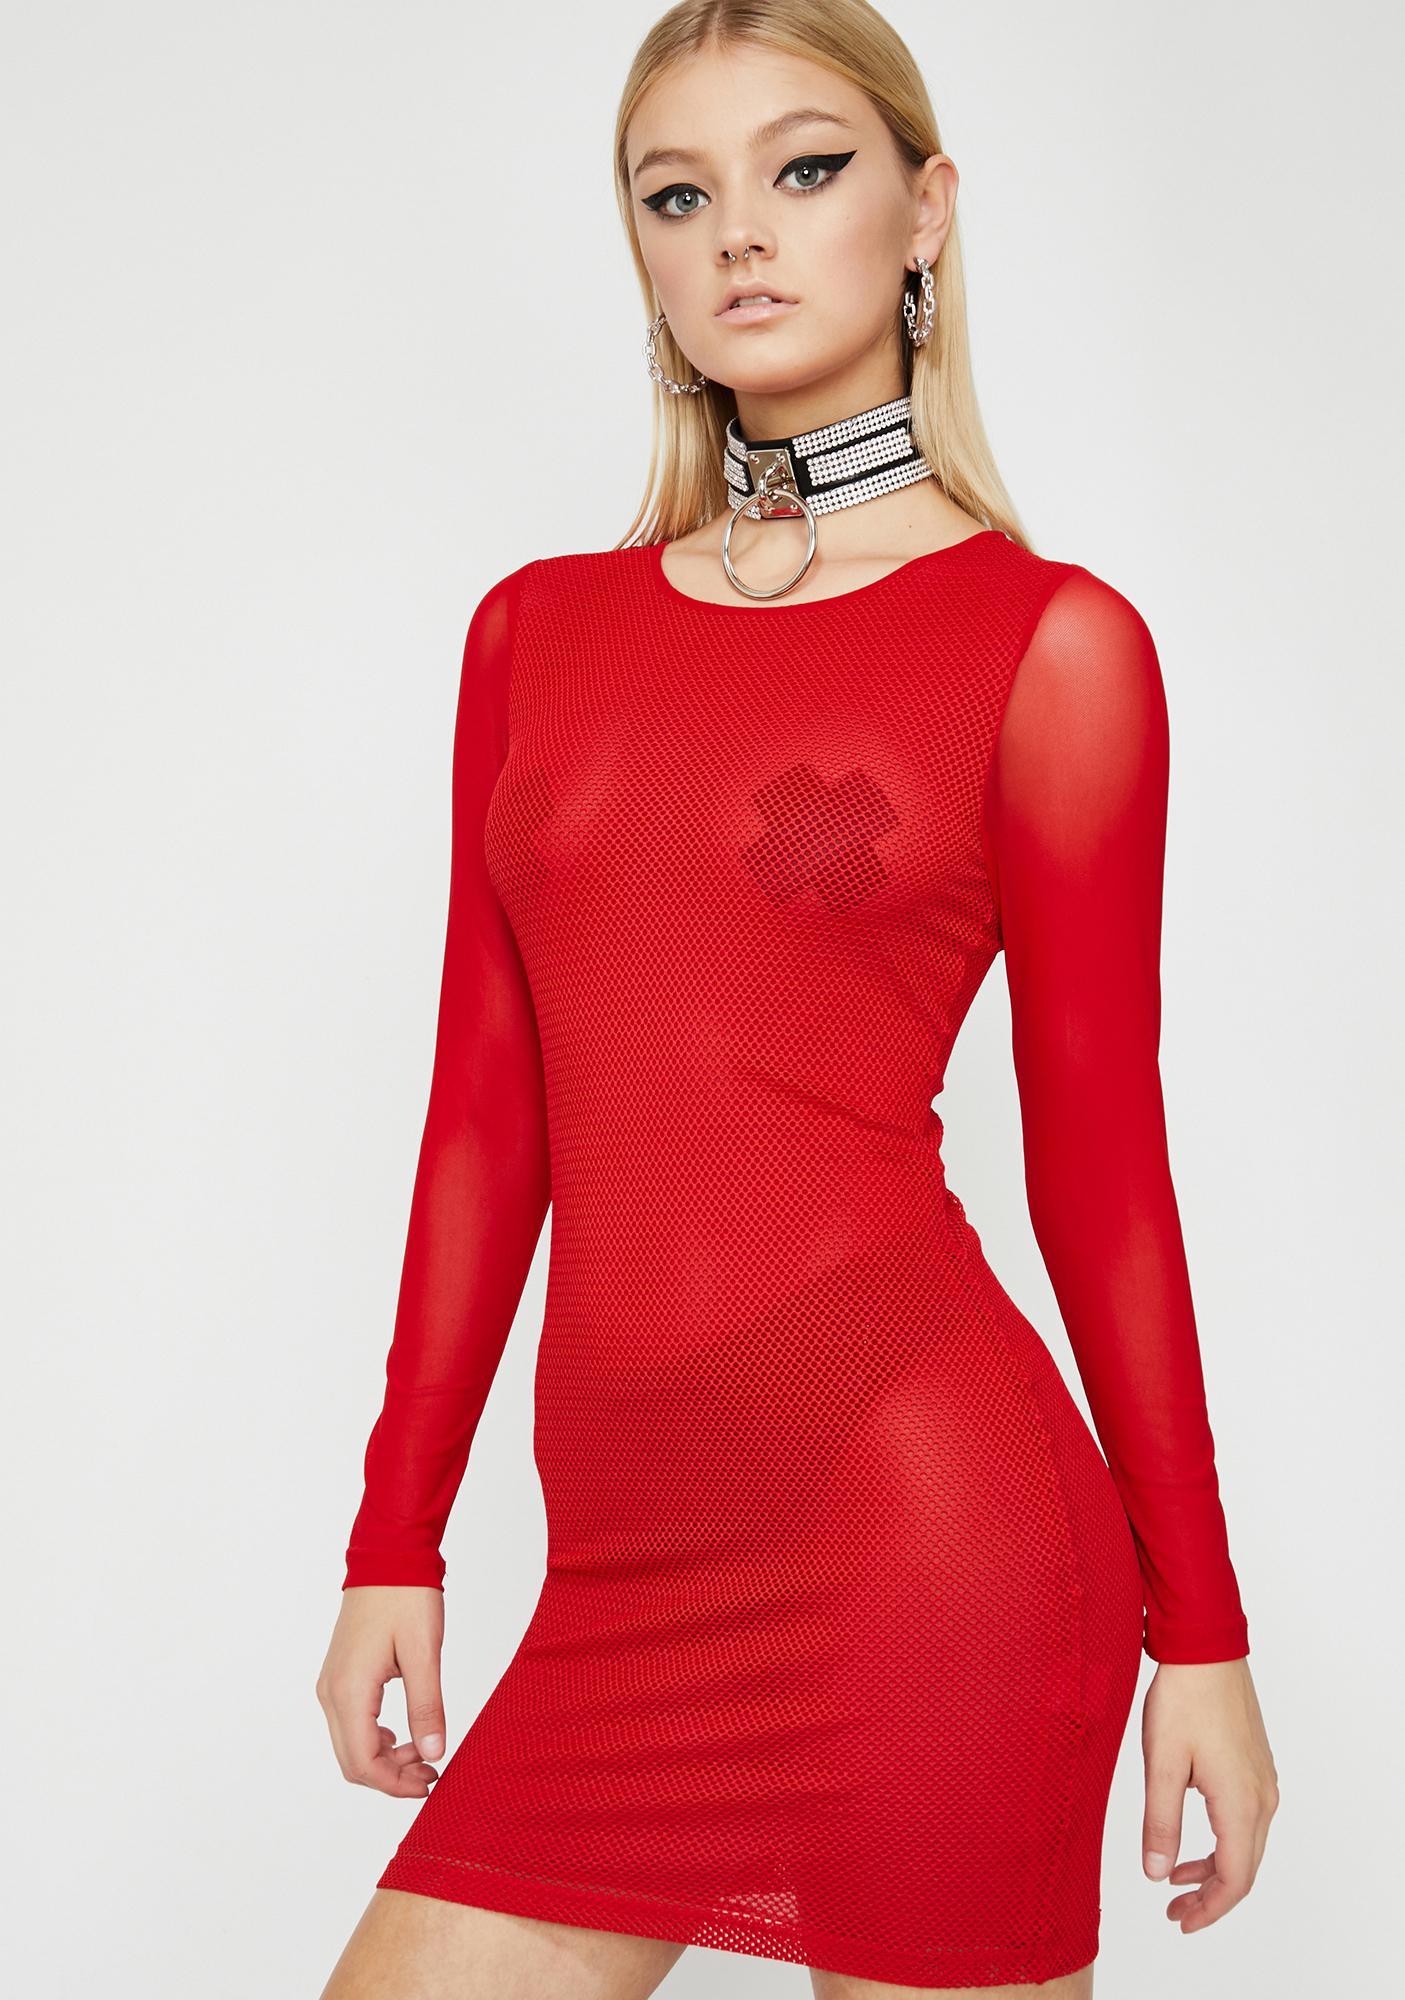 Love Tonightz Turmoil Sheer Dress